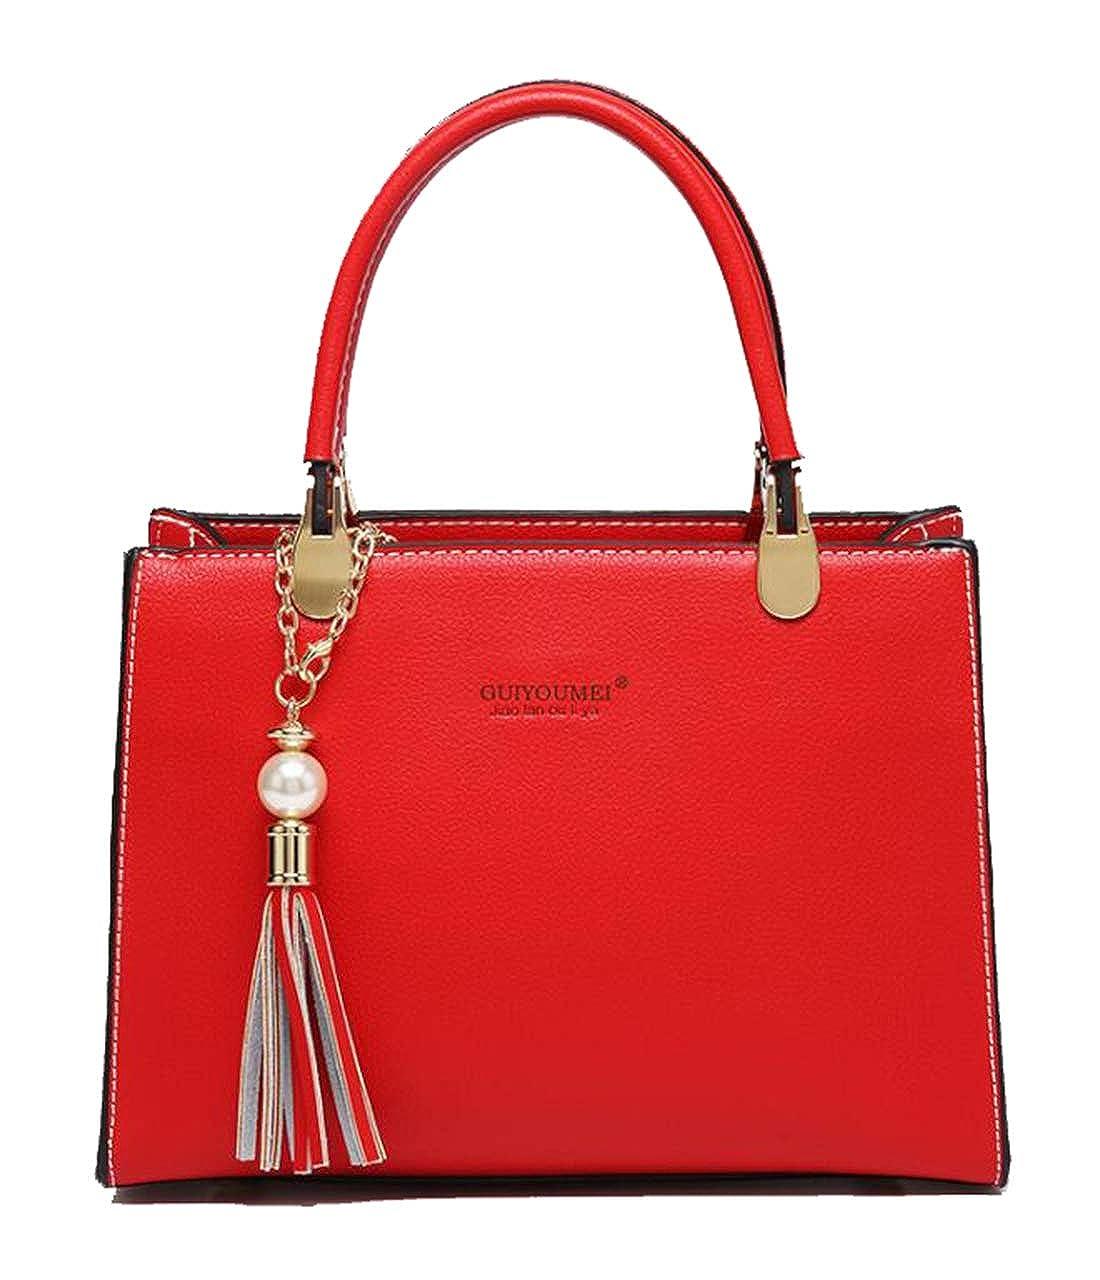 Red 18 Yan Show Women's PU Satchel Elegant Handbag Shoulder Bag Top Handle Bag Purse